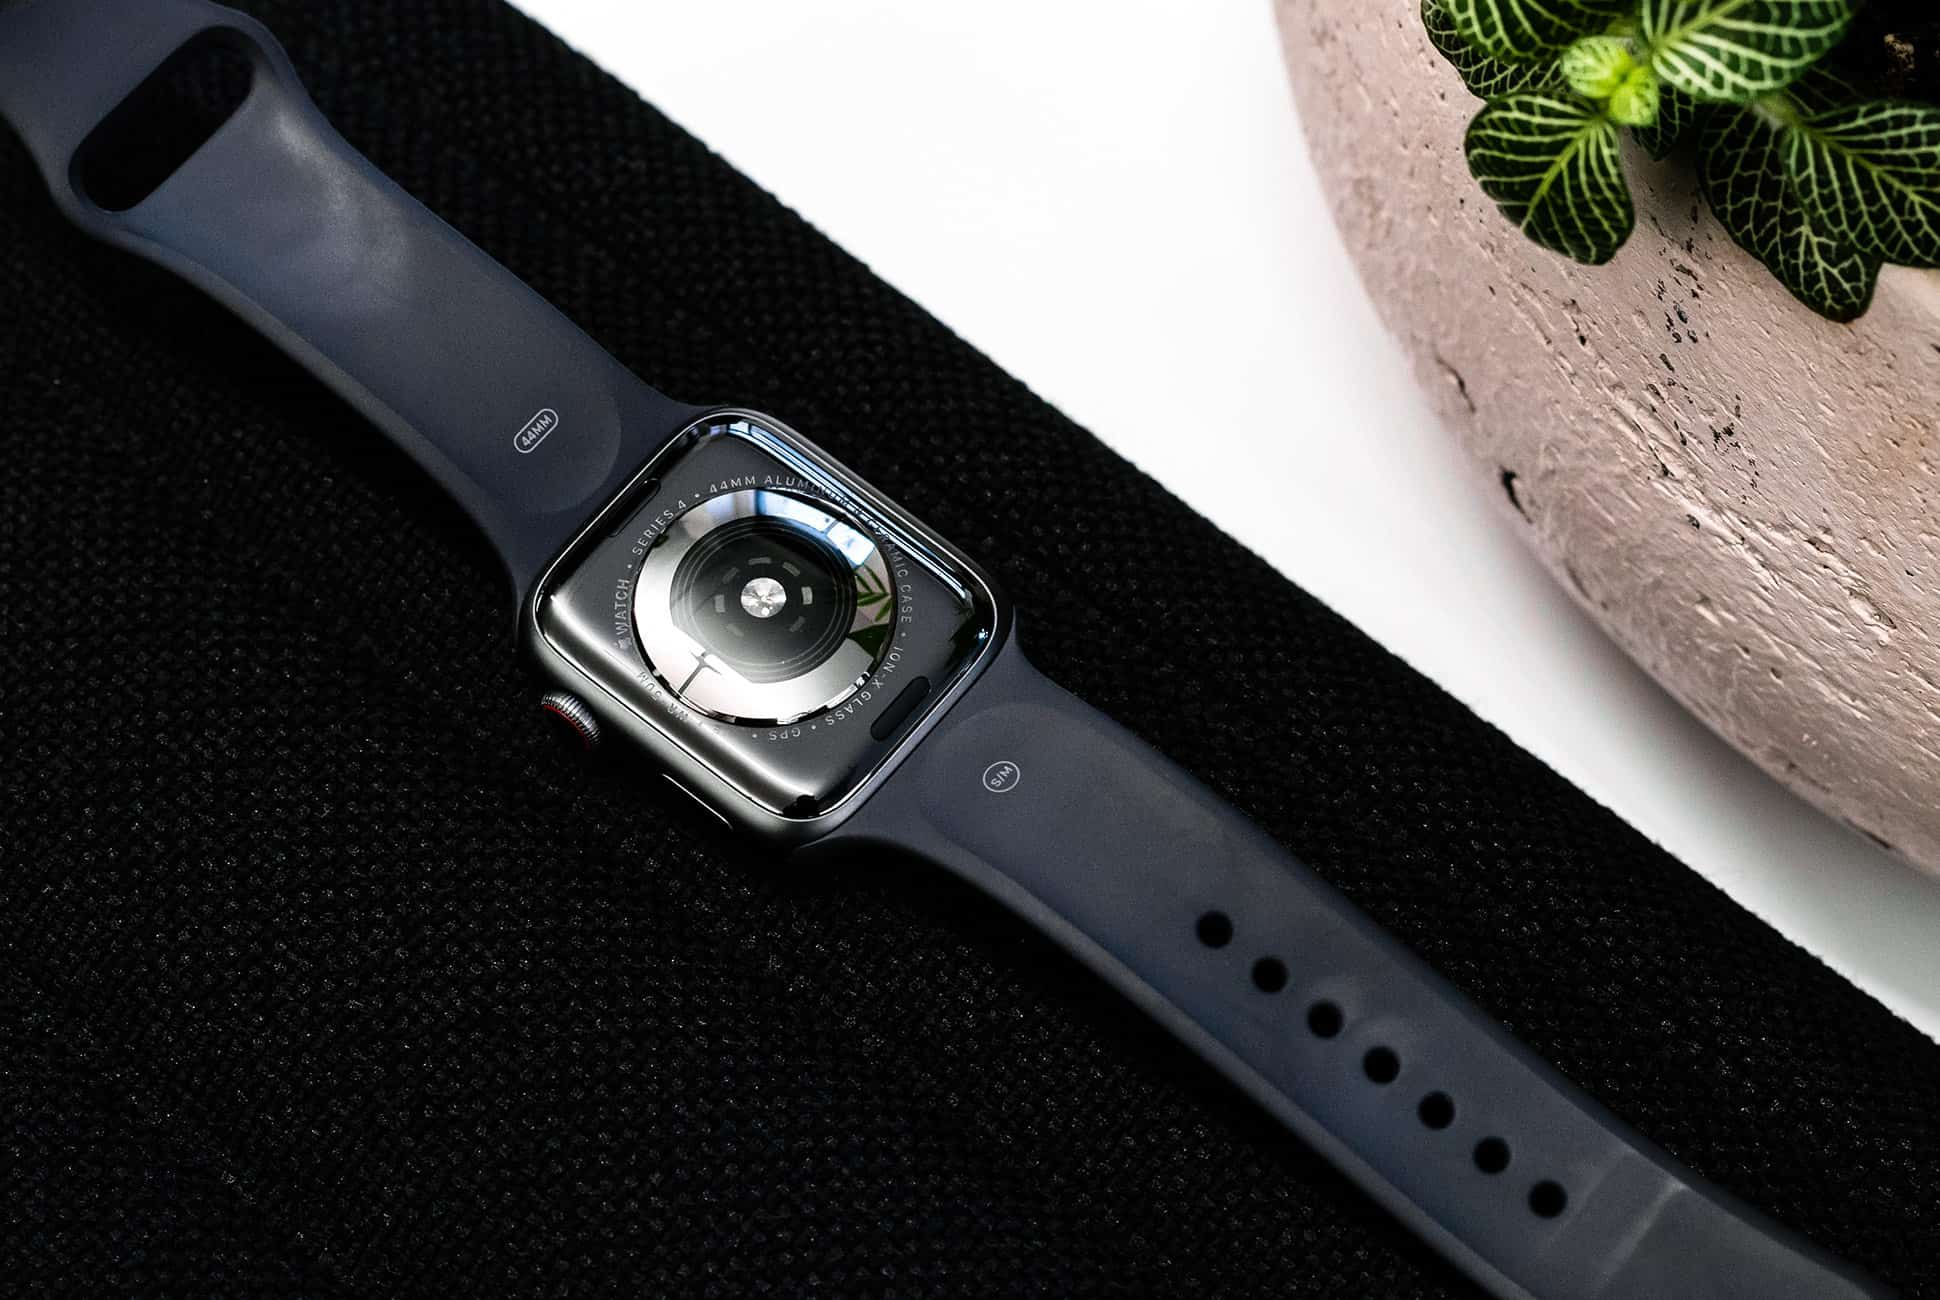 Apple-Watch-Series-4-Review-gear-patrol-slide-2